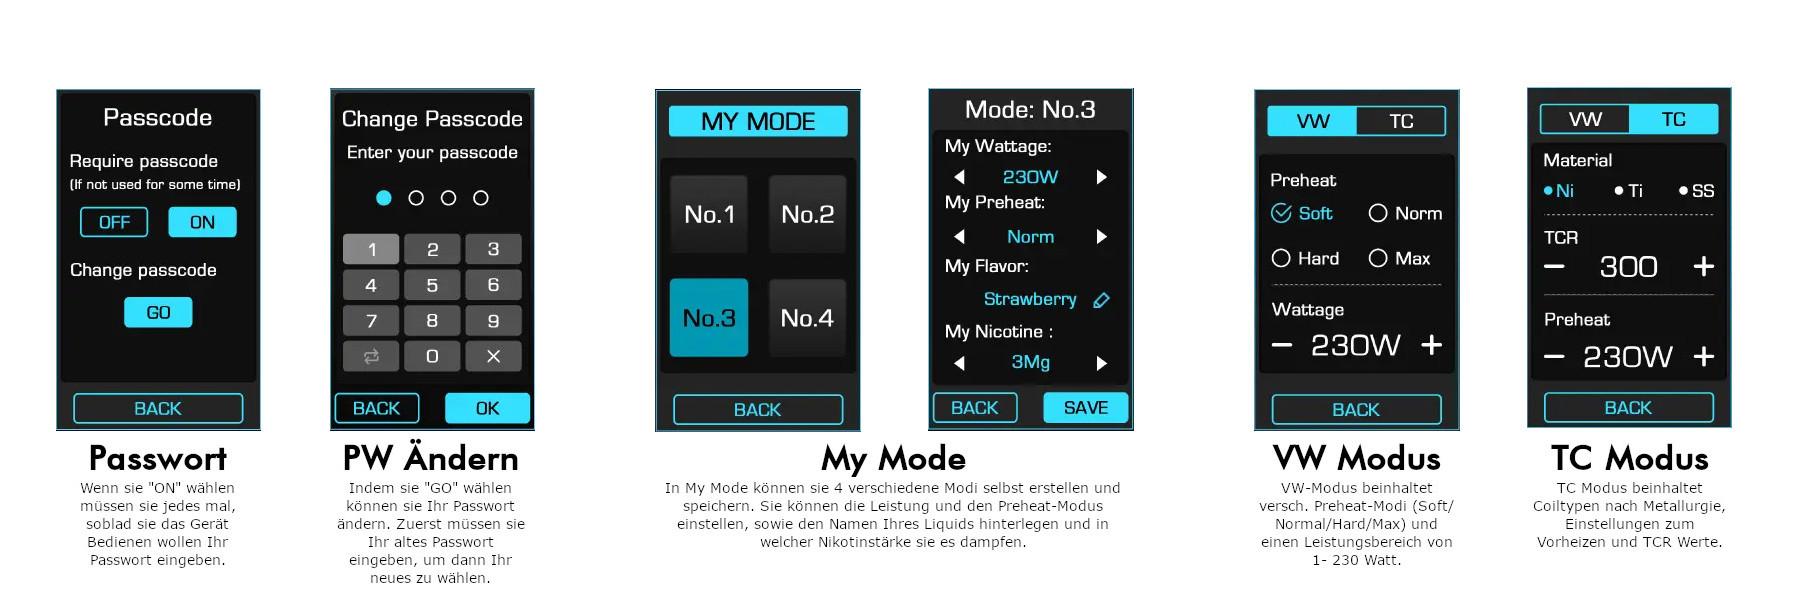 Smok G-Priv 3 Mod